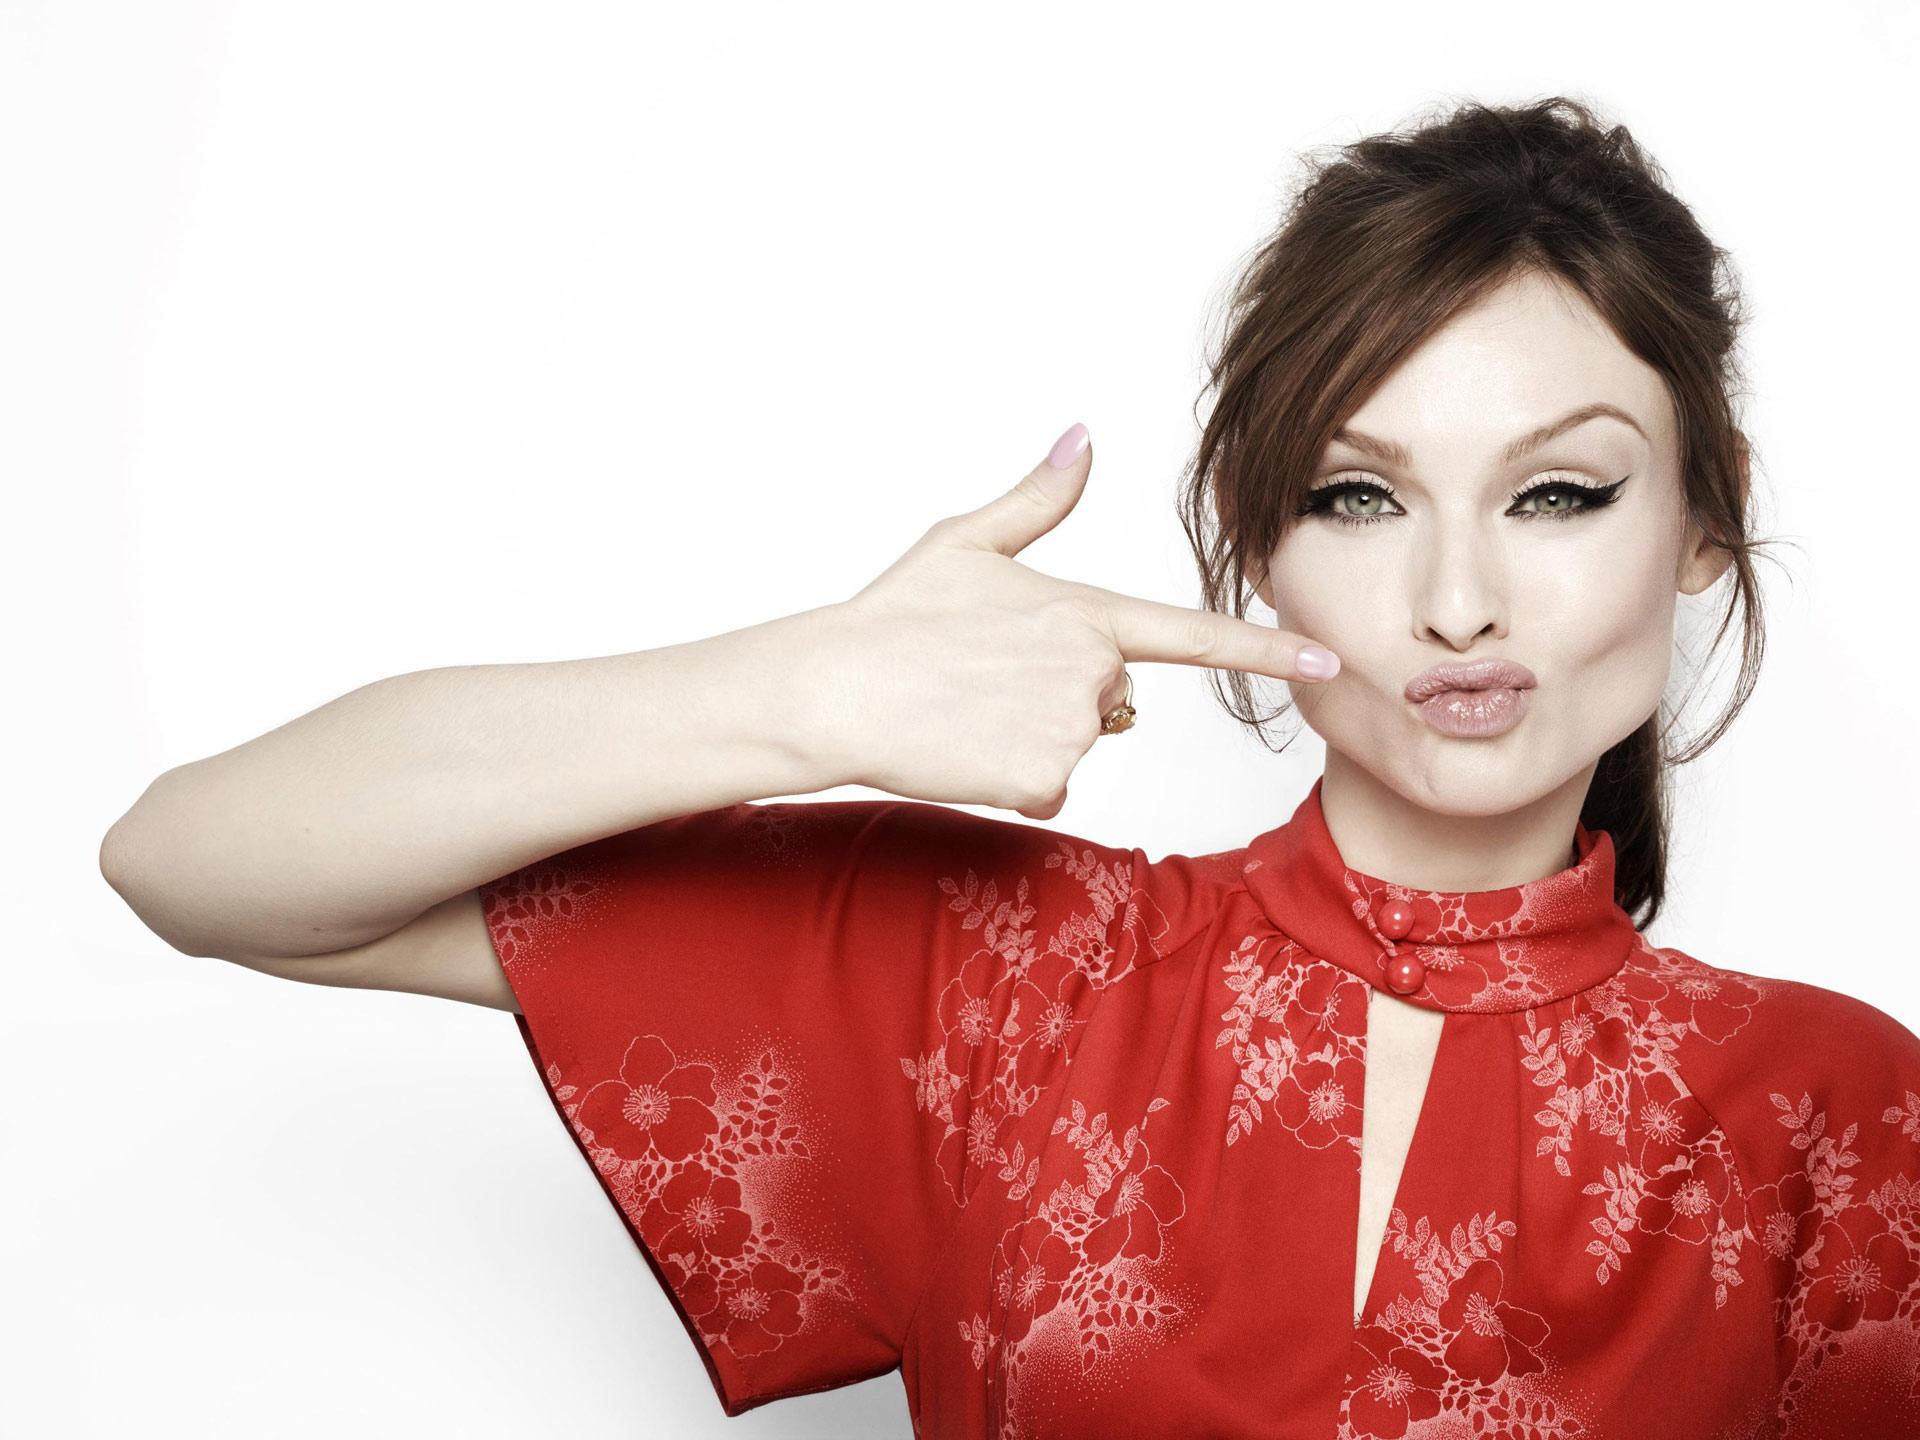 Sophie Ellis-Bextor 2014 download